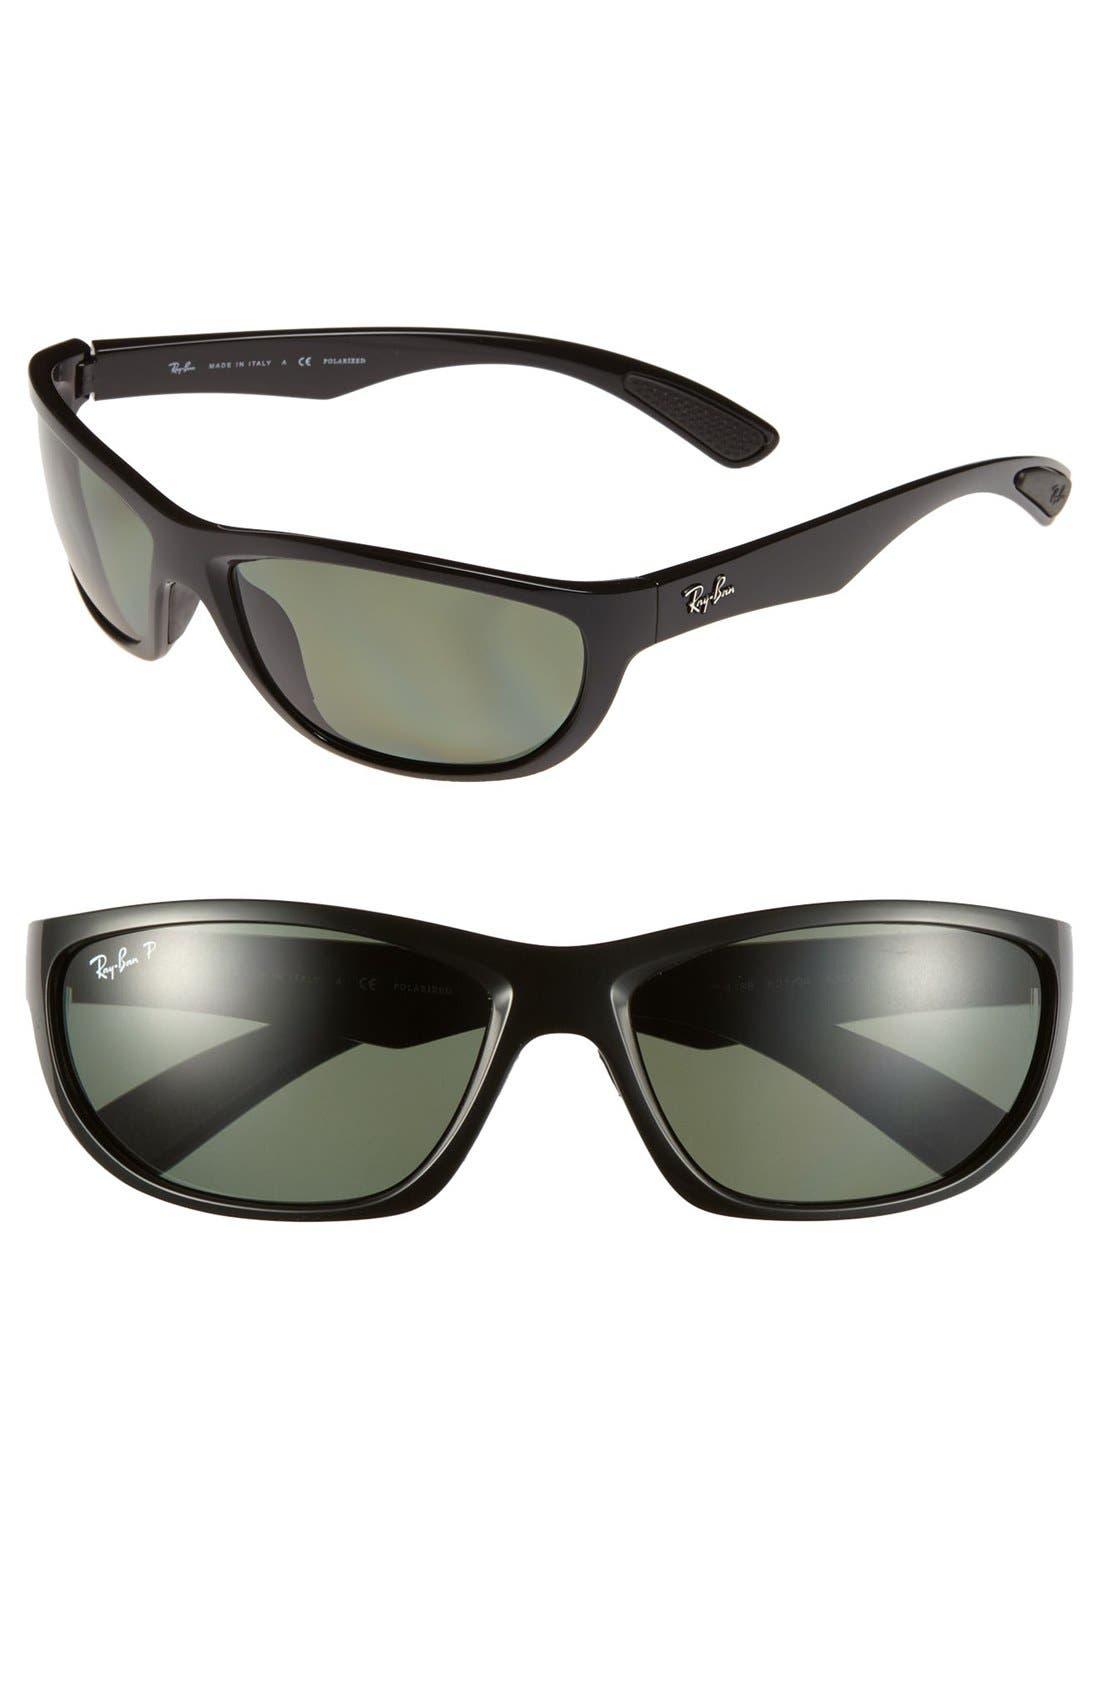 Main Image - Ray-Ban 63mm Polarized Sunglasses